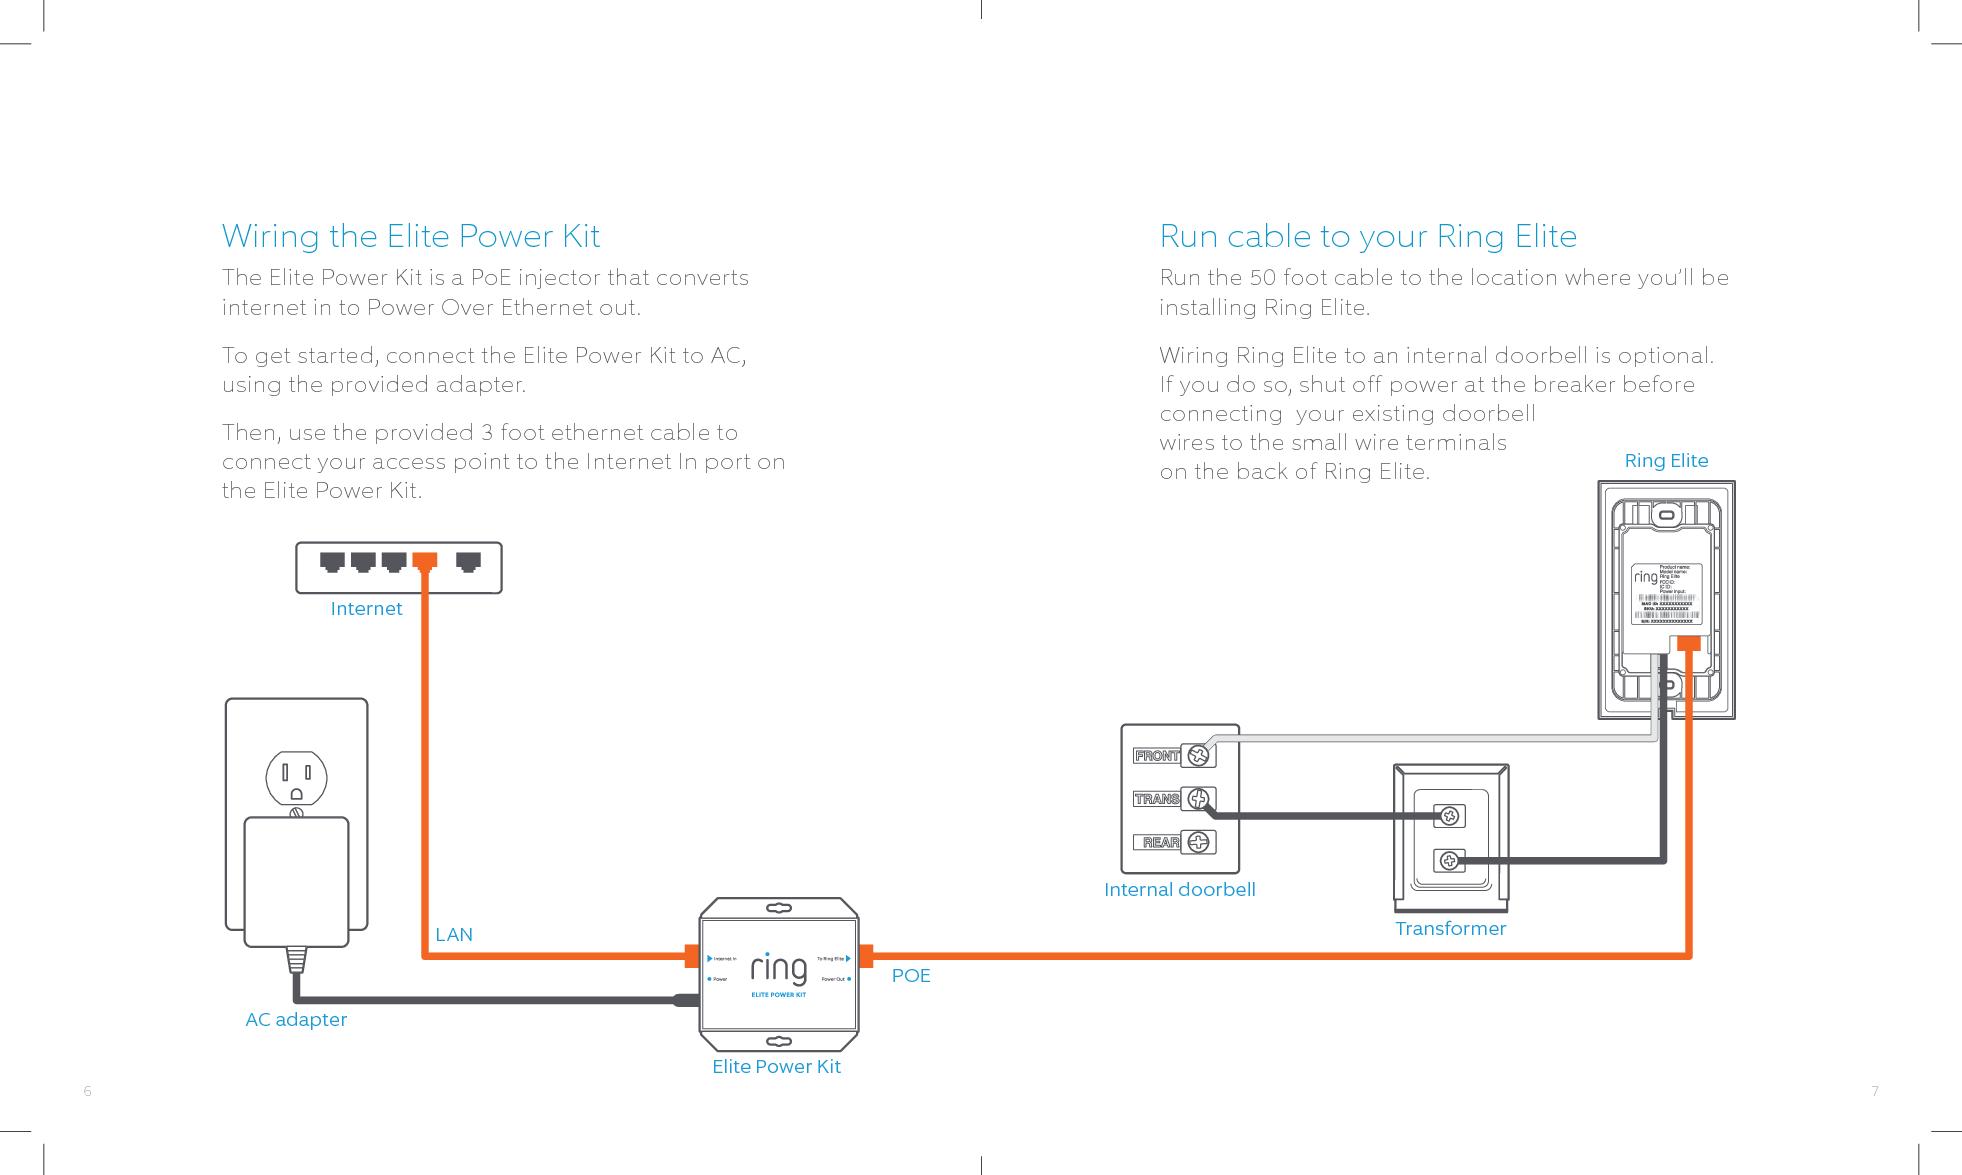 Cr 5462 Diagram On Doorbell Inter Wiring Diagram On Inter Wiring Diagram Wiring Diagram